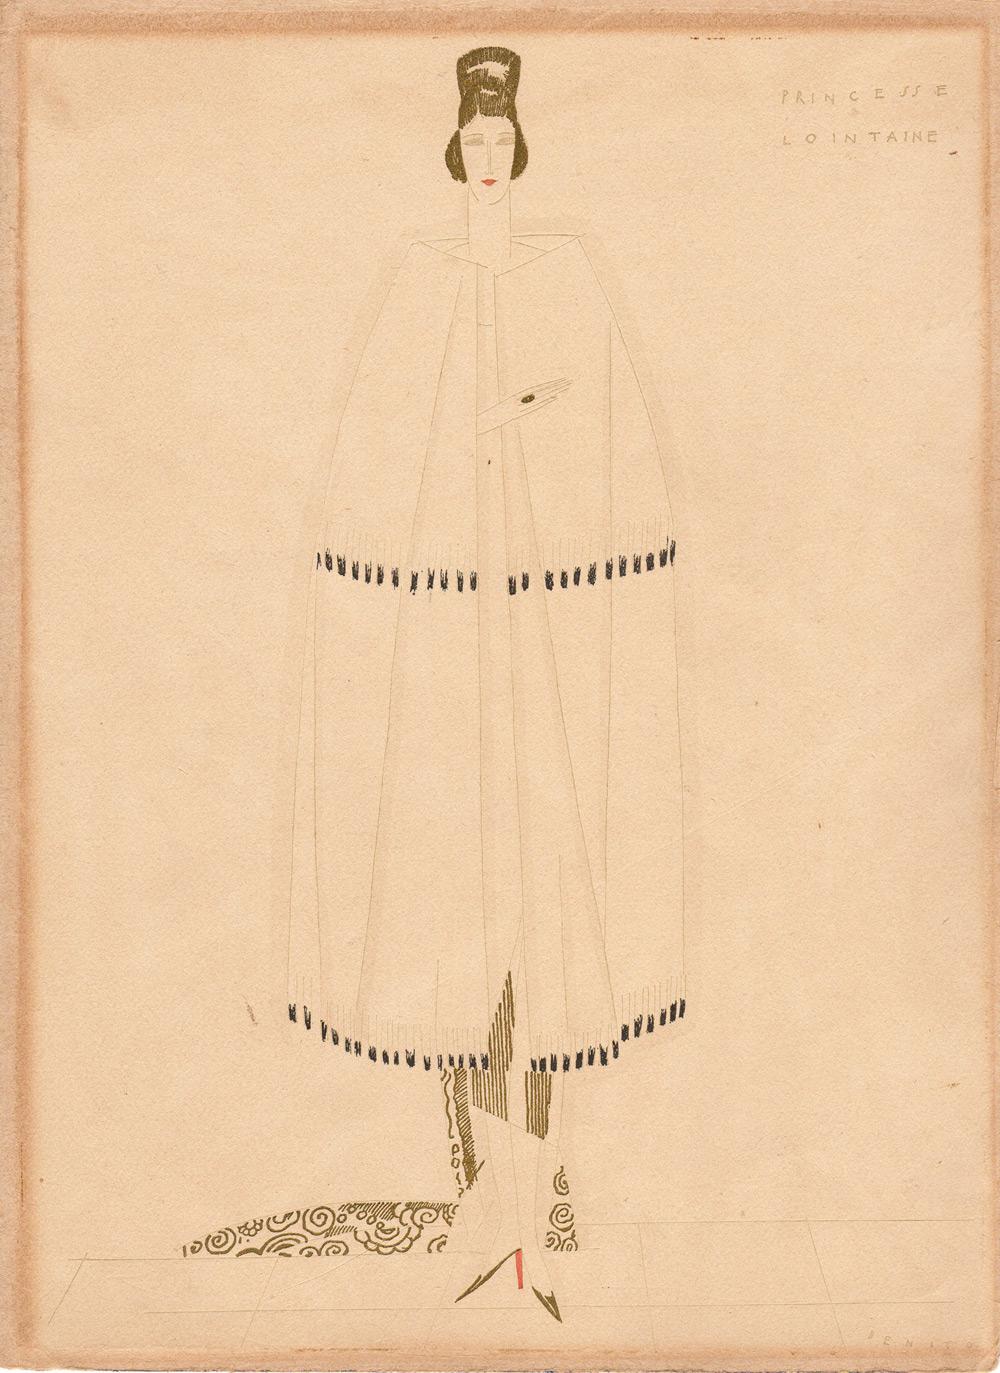 Princesse lointaine | Benito | Princesse lointaine